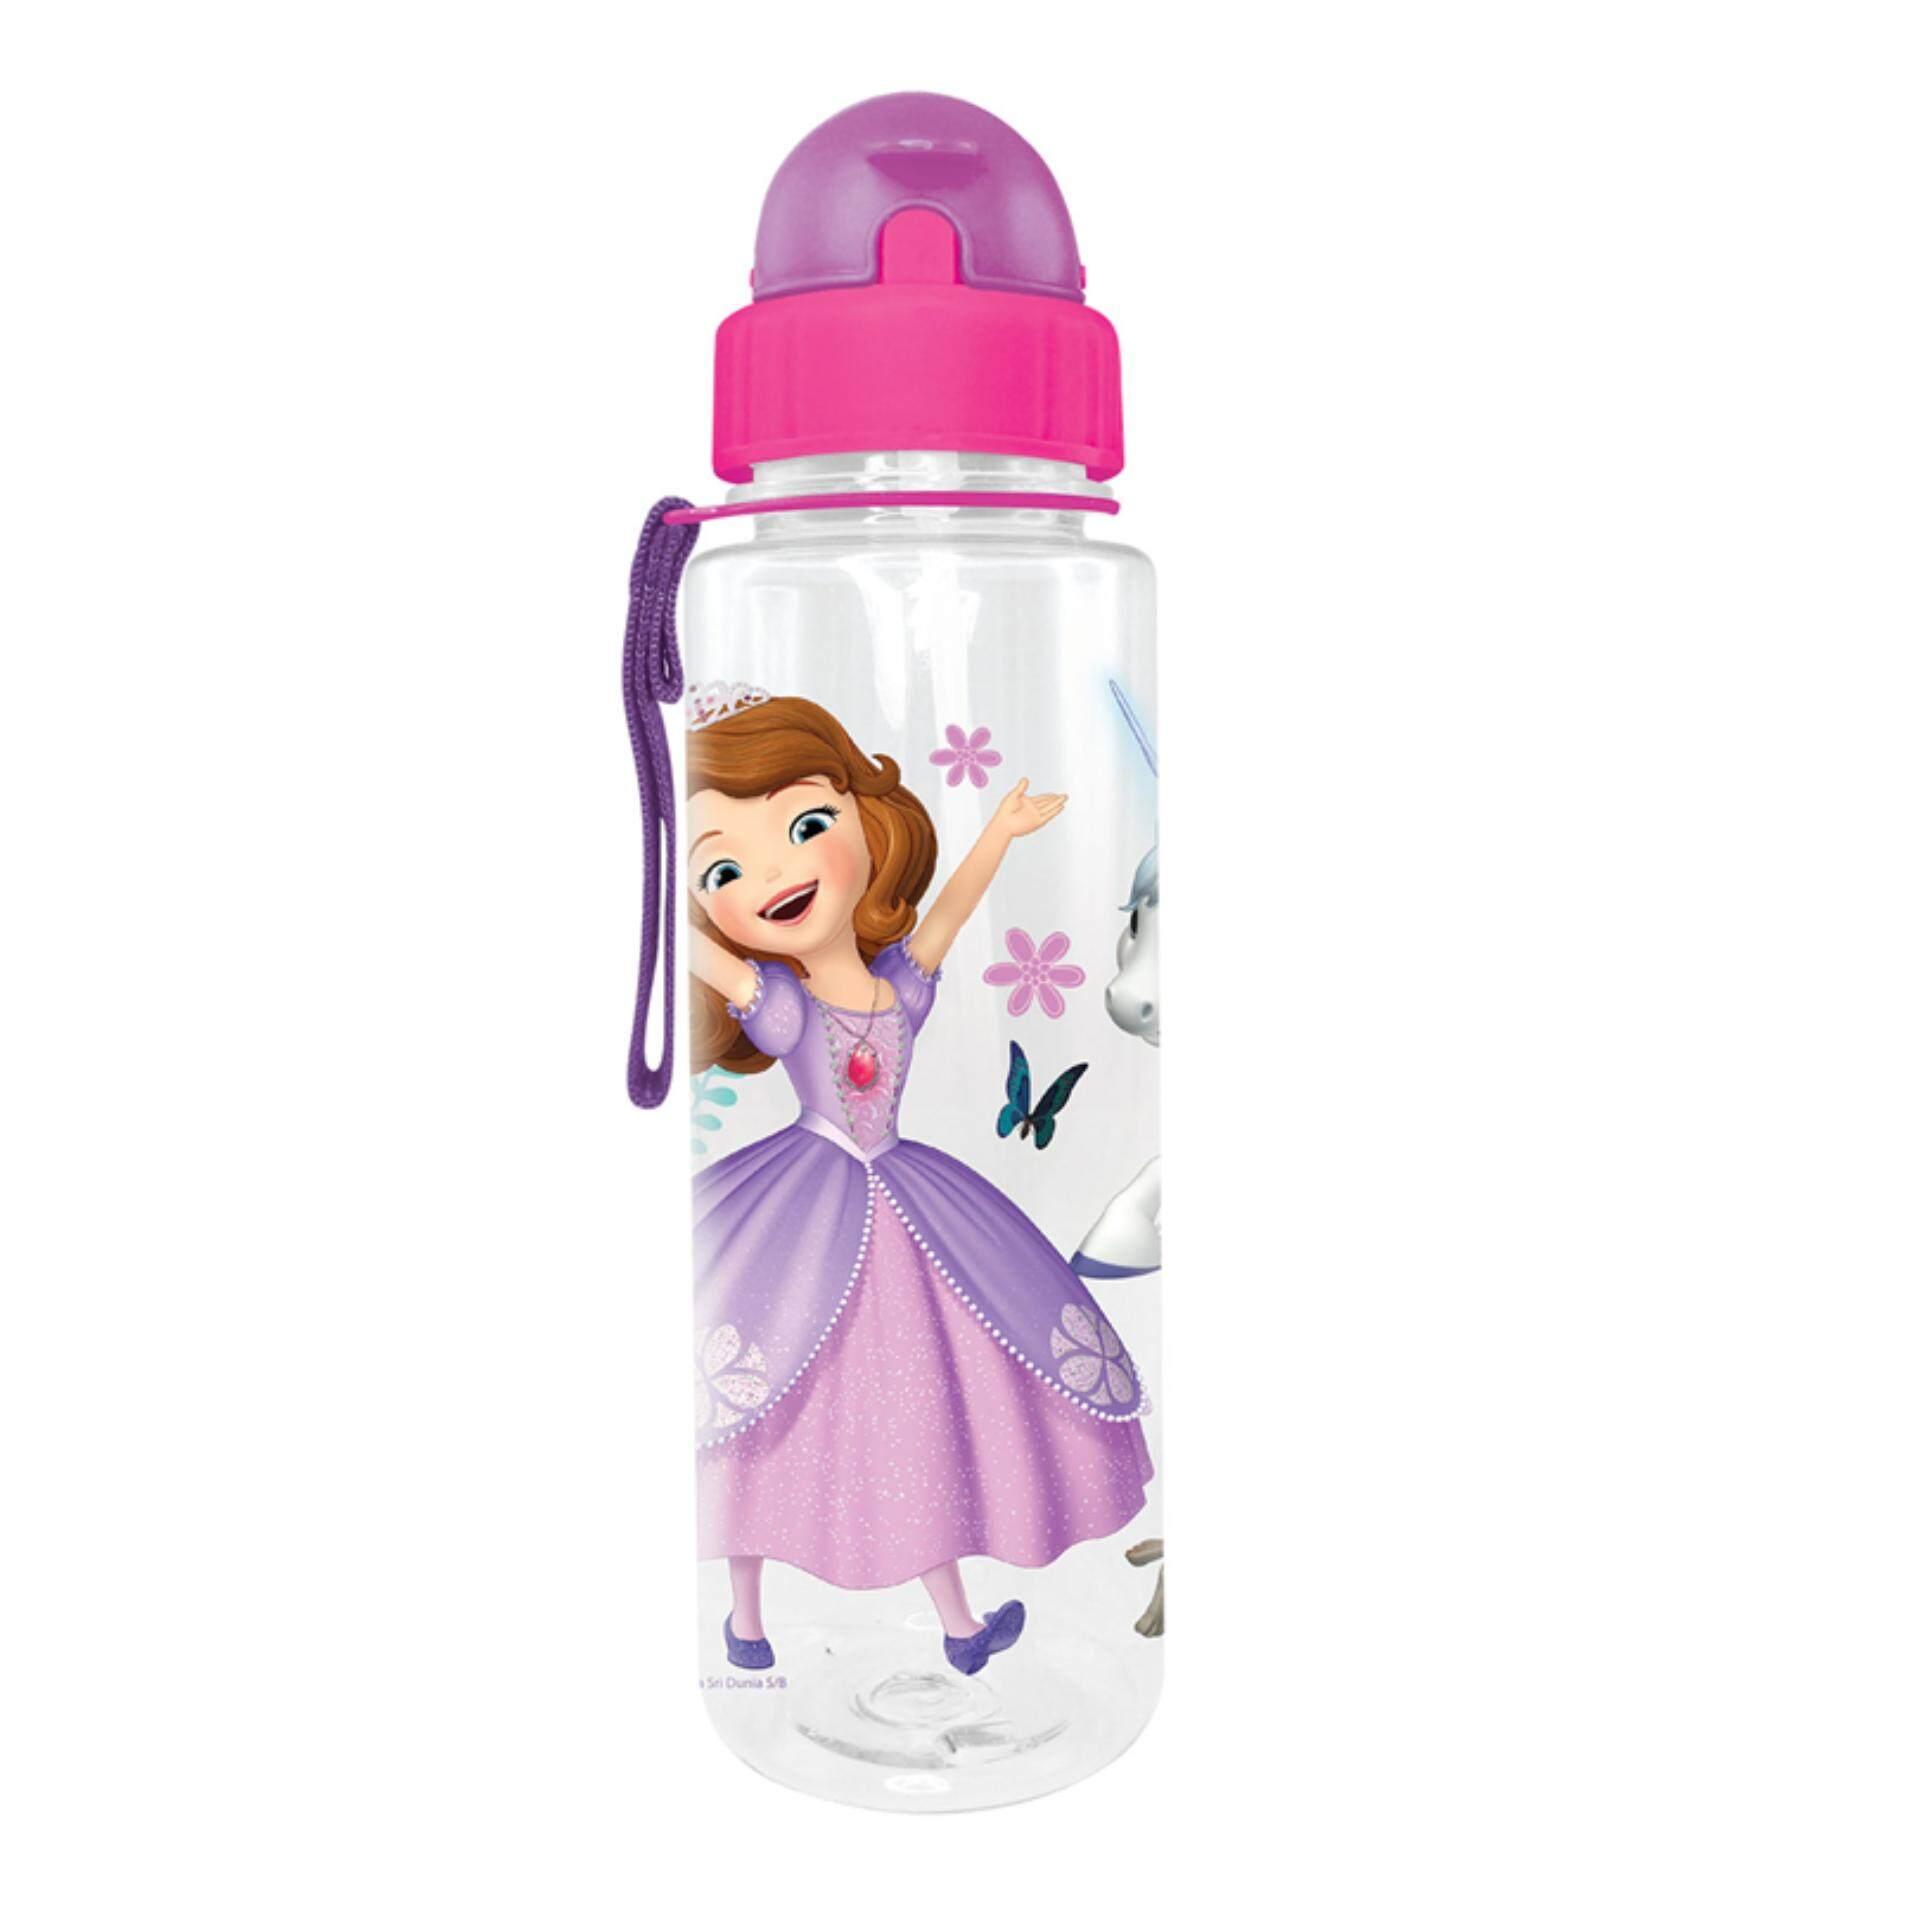 Disney Princess Sofia 650ML Tritan Bottle With Straw - Dark Pink Colour